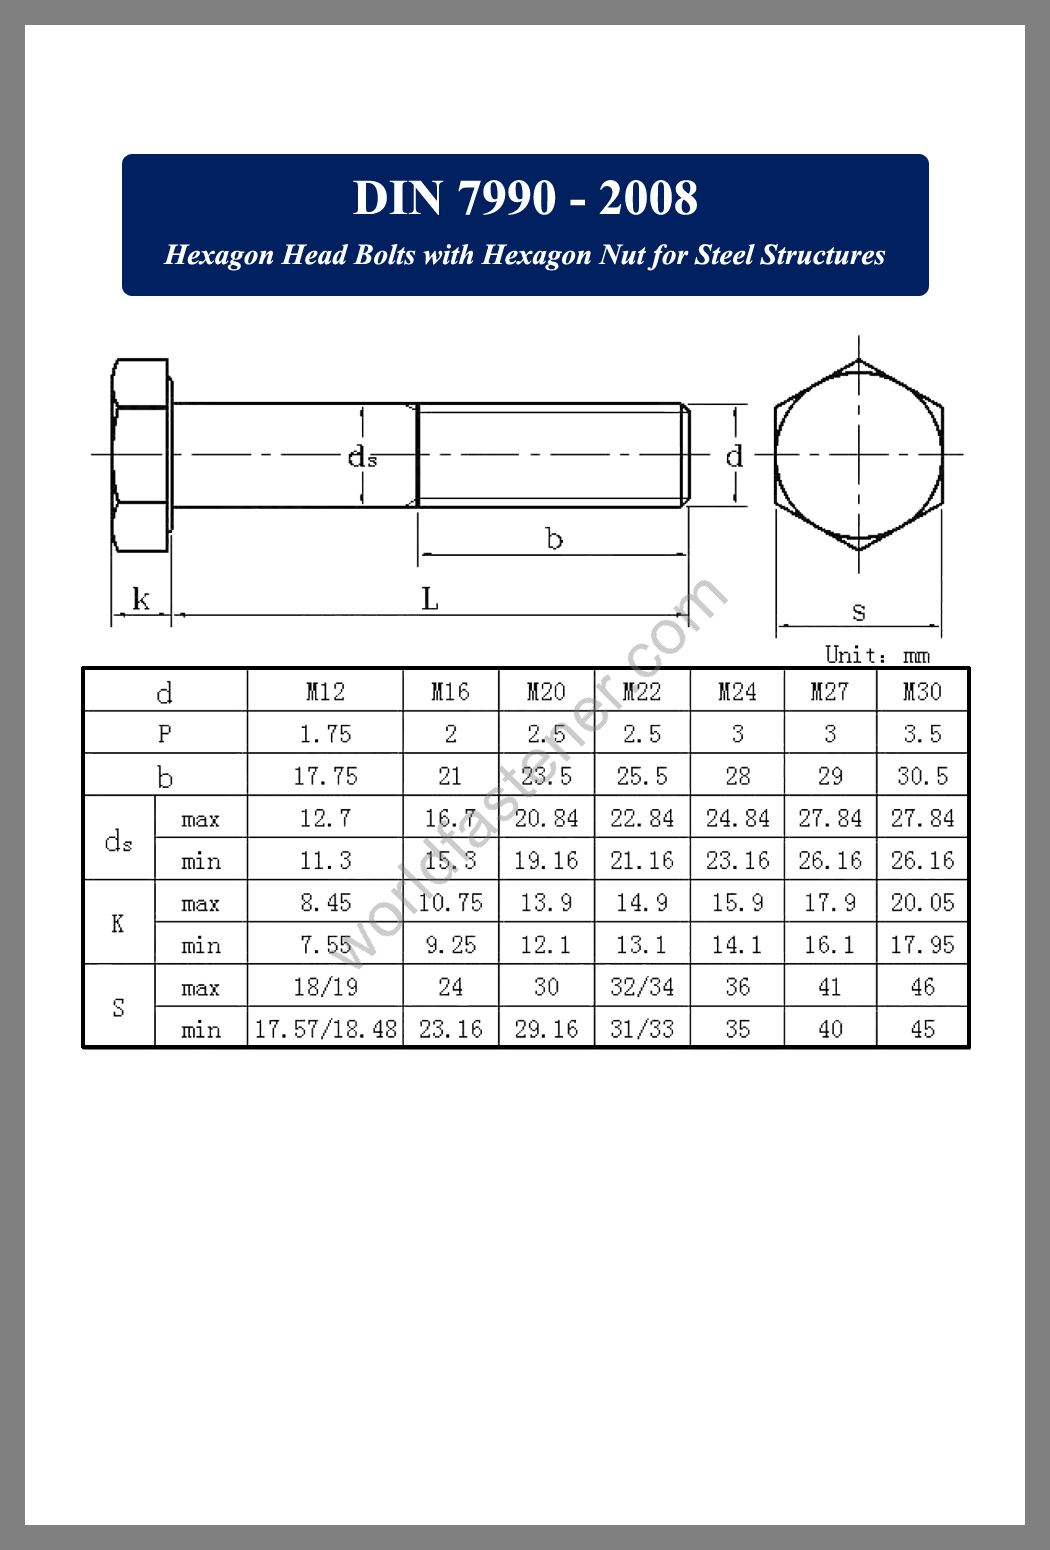 DIN 7990, DIN 7990 Hexagon Bolts for Steel Structures, fastener, screw, bolt